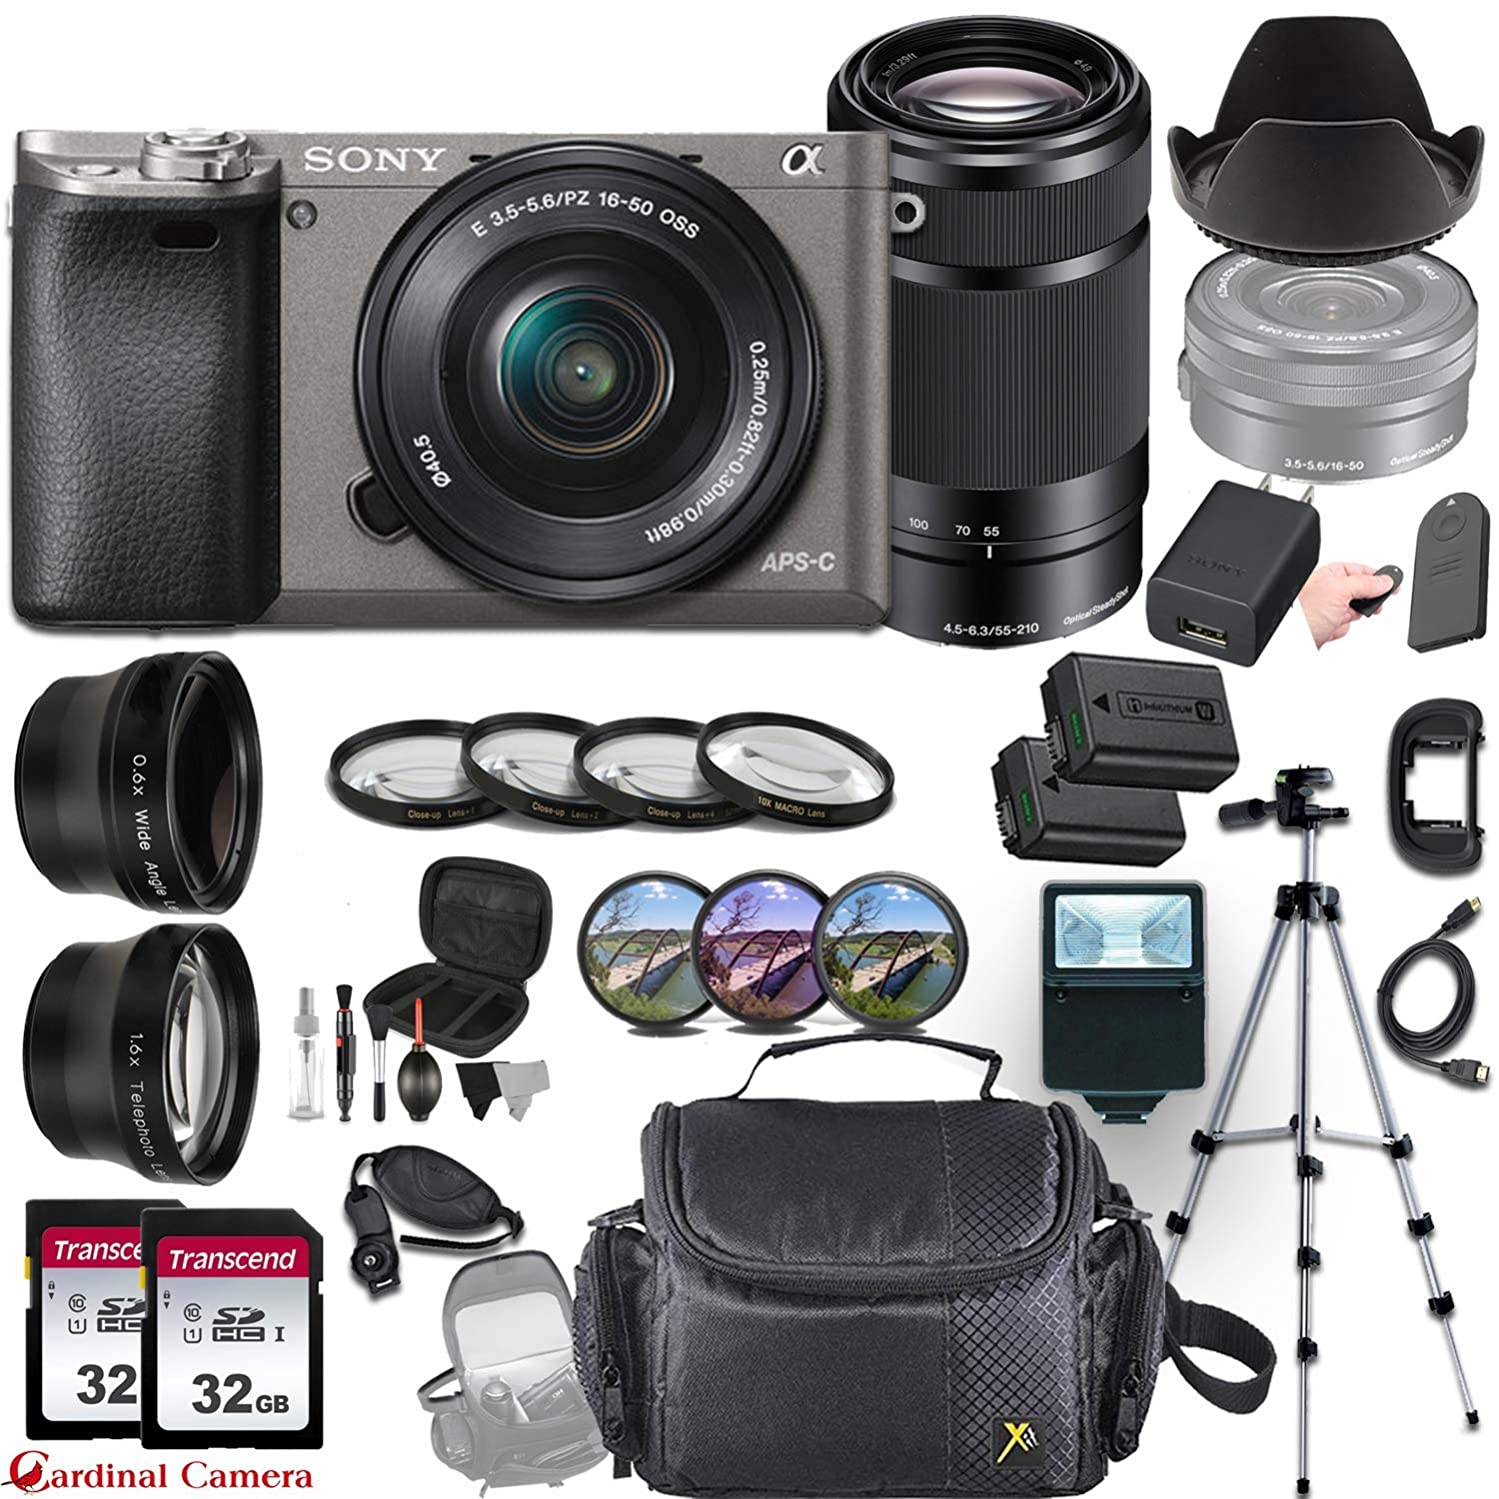 Sony Alpha a6000 (Graphite) Mirrorless E-Mount Camera and 2 Sony Lens Bundle (E 16–50mm f/3.5–5.6 OSS and E 55–210mm f/4.5-6.3 OSS) + Professional Accessory-Kit